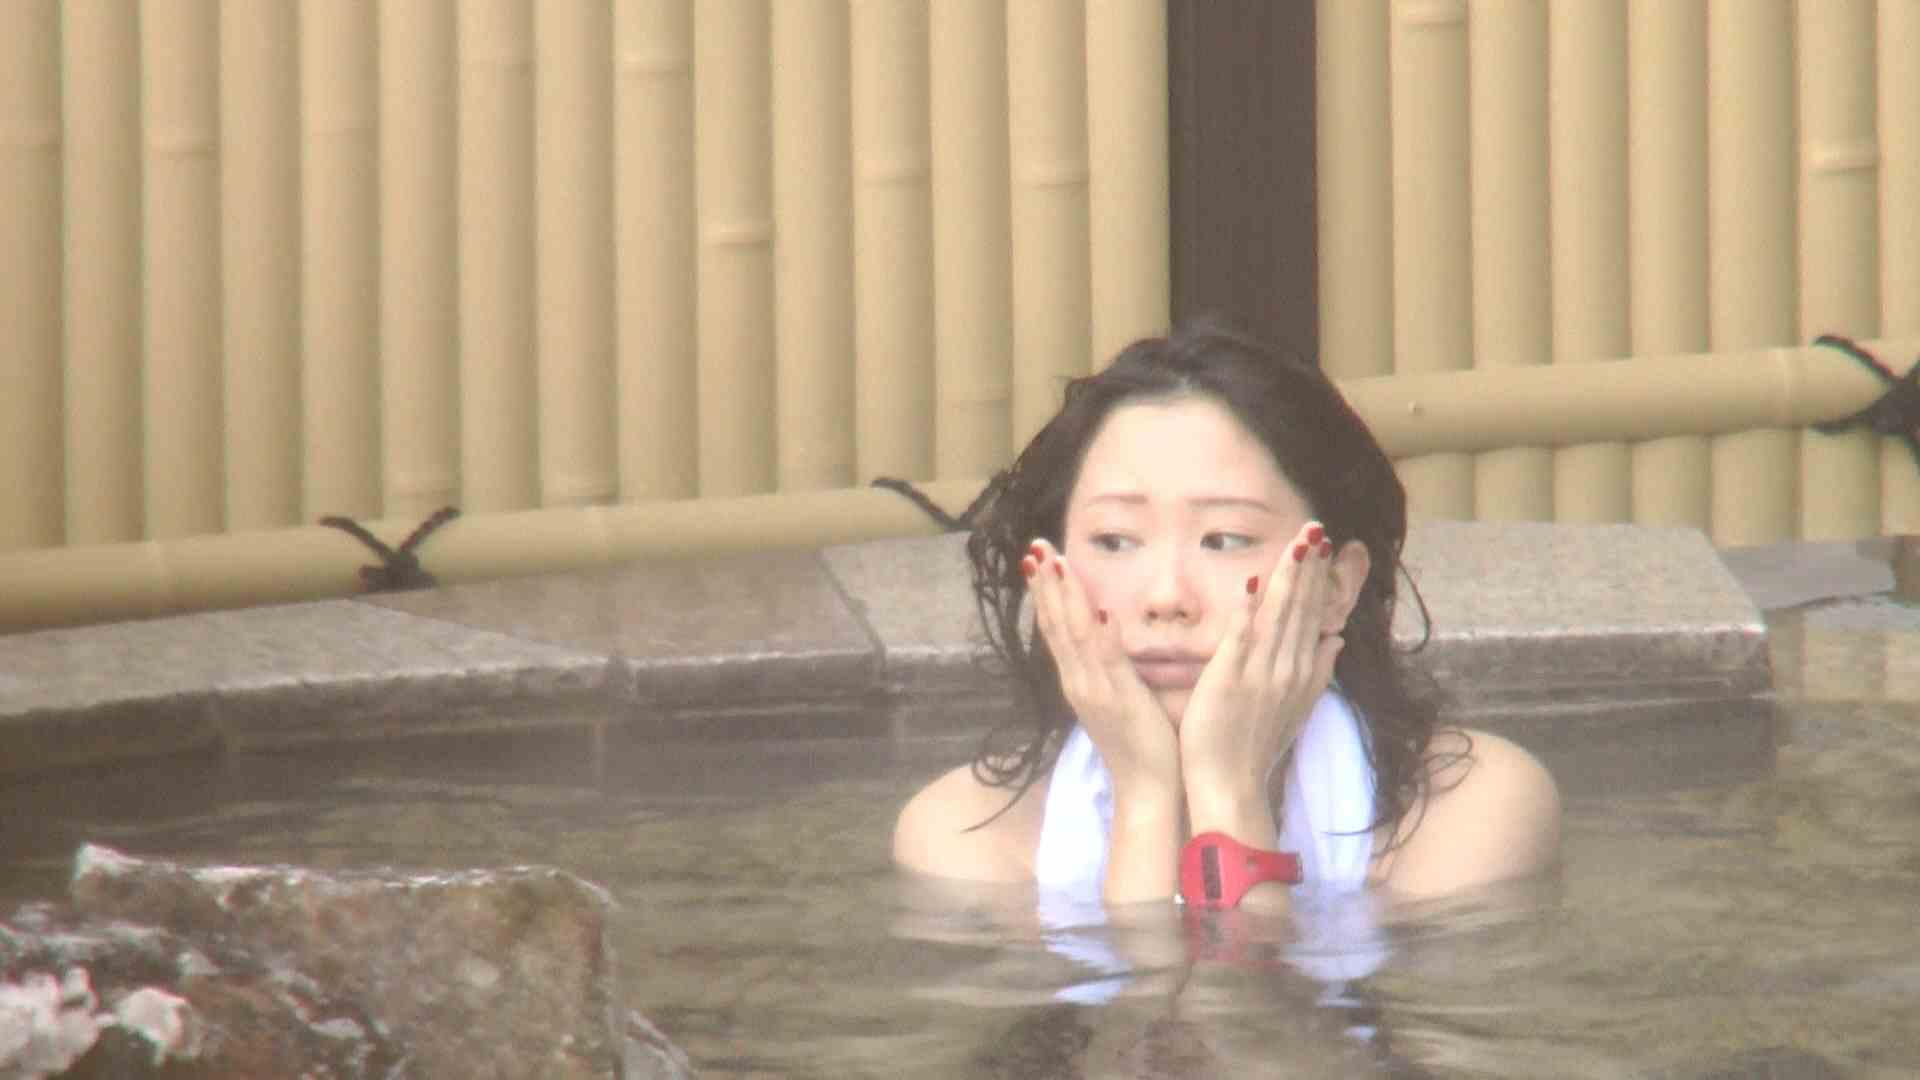 Aquaな露天風呂Vol.211 0   0  16連発 1